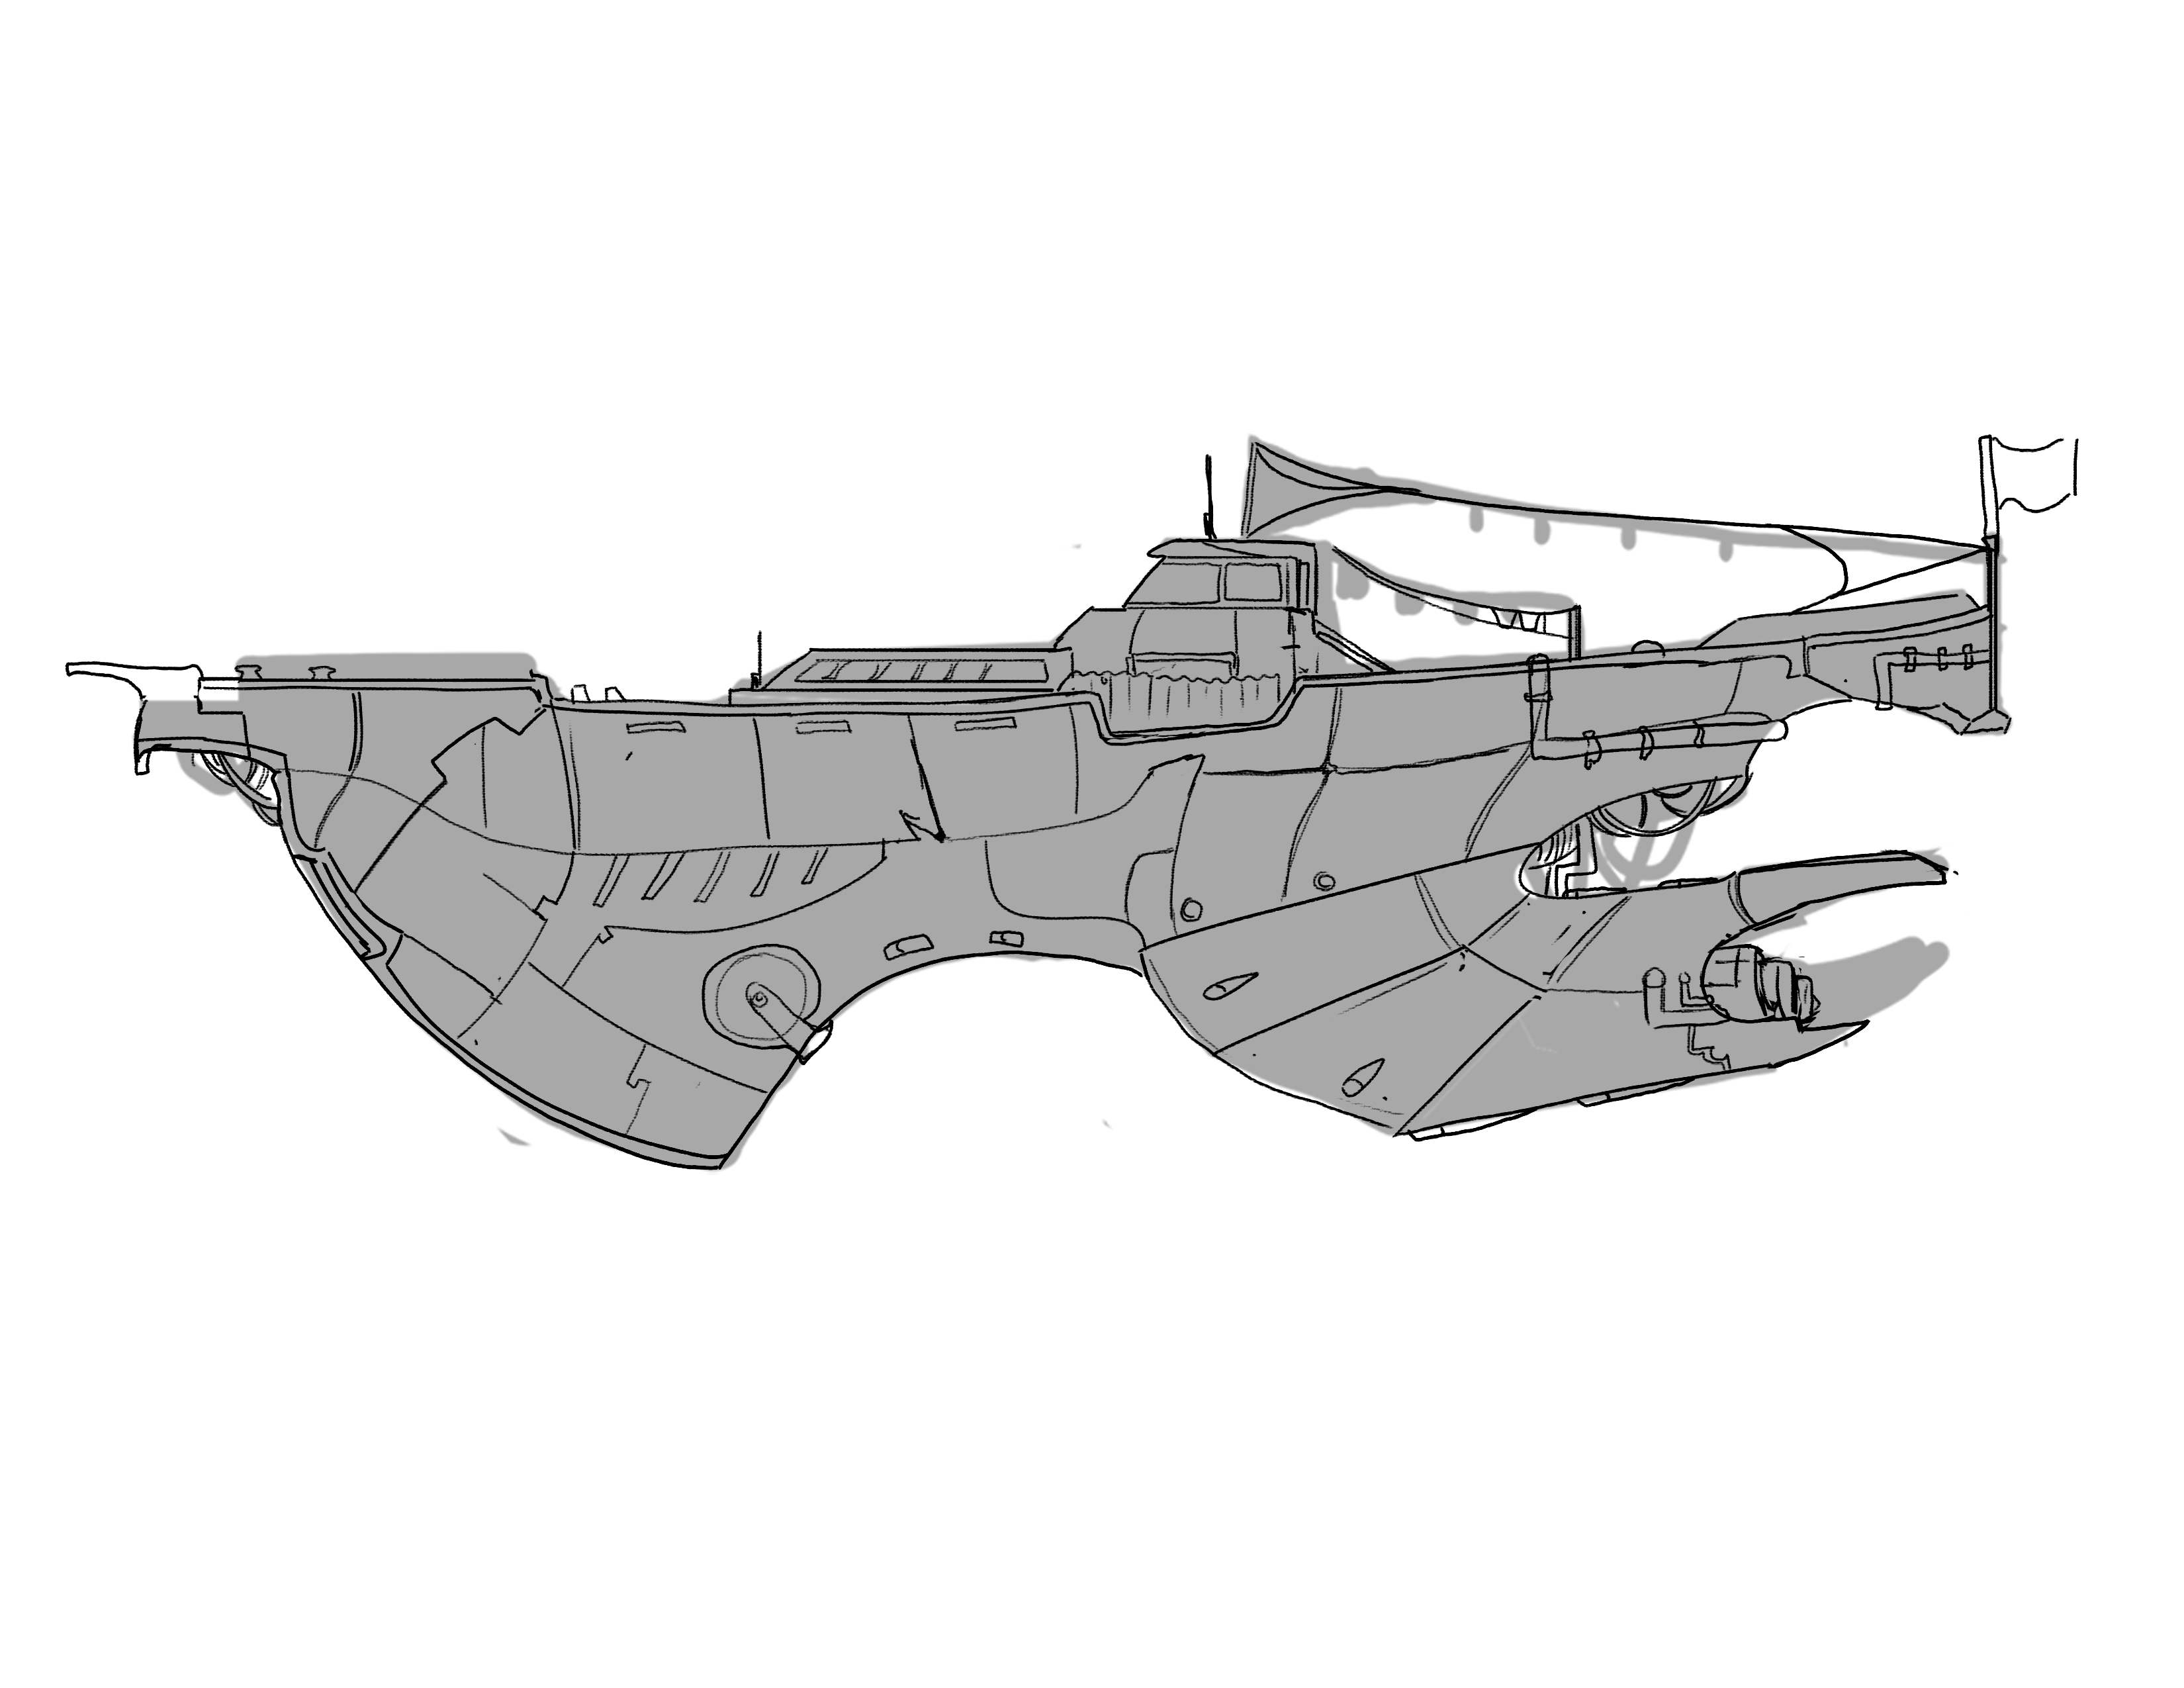 Boat_process